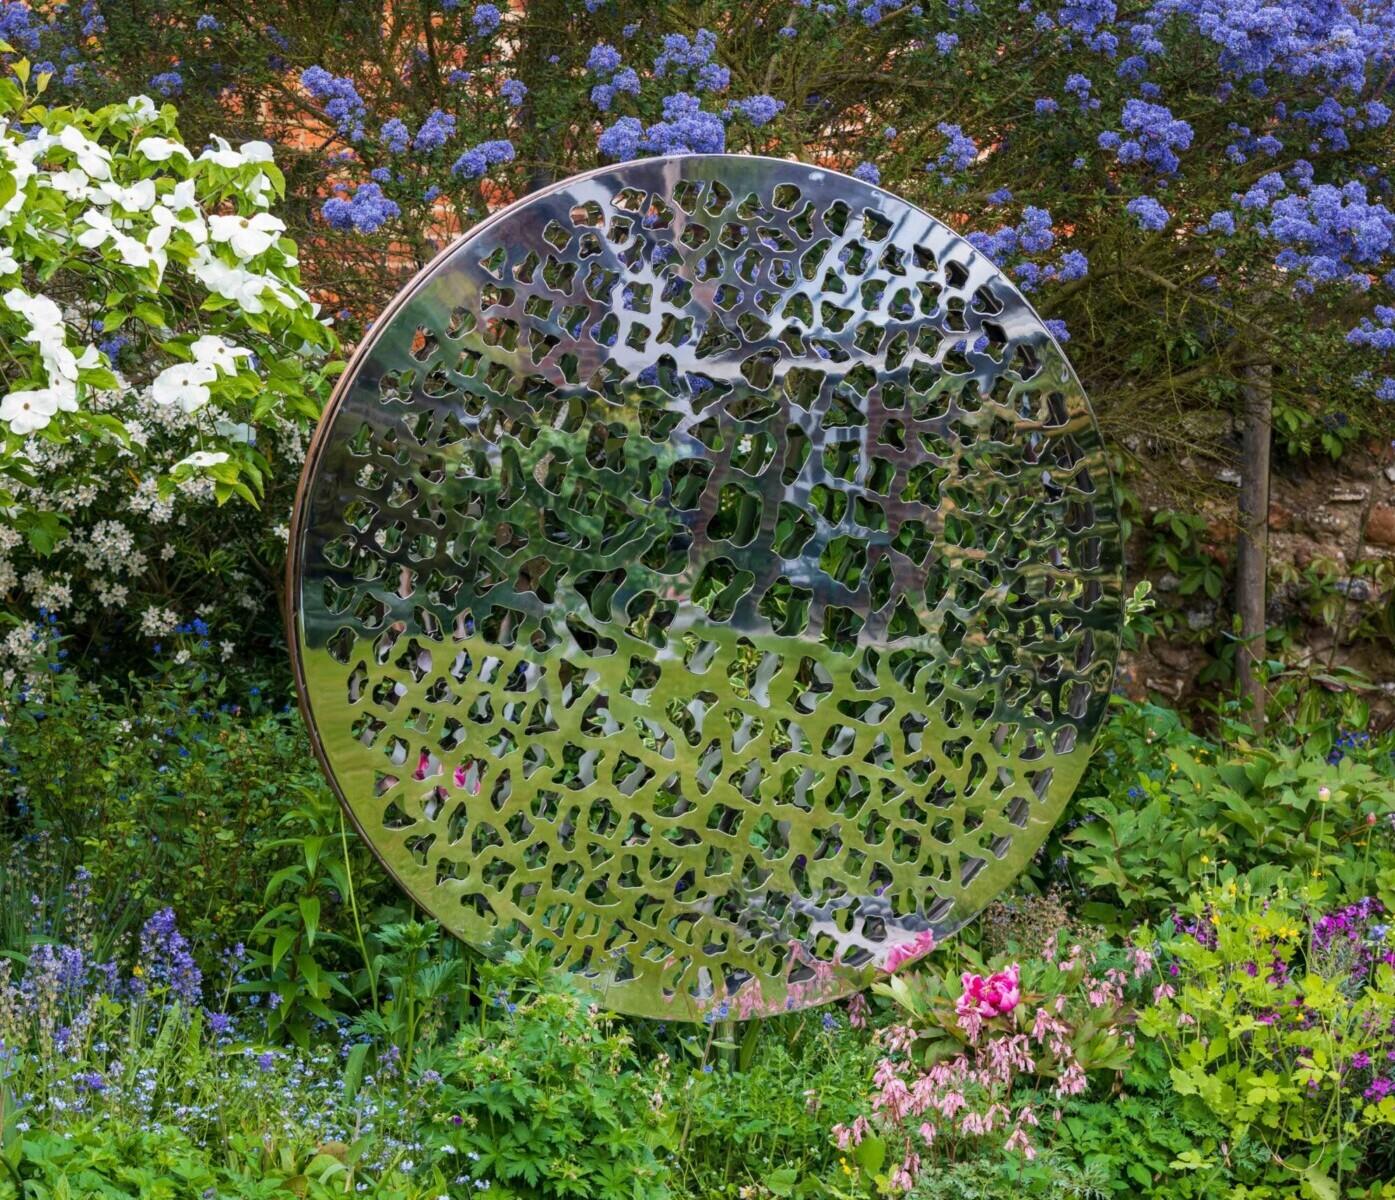 The Art of Selecting a Garden Sculpture